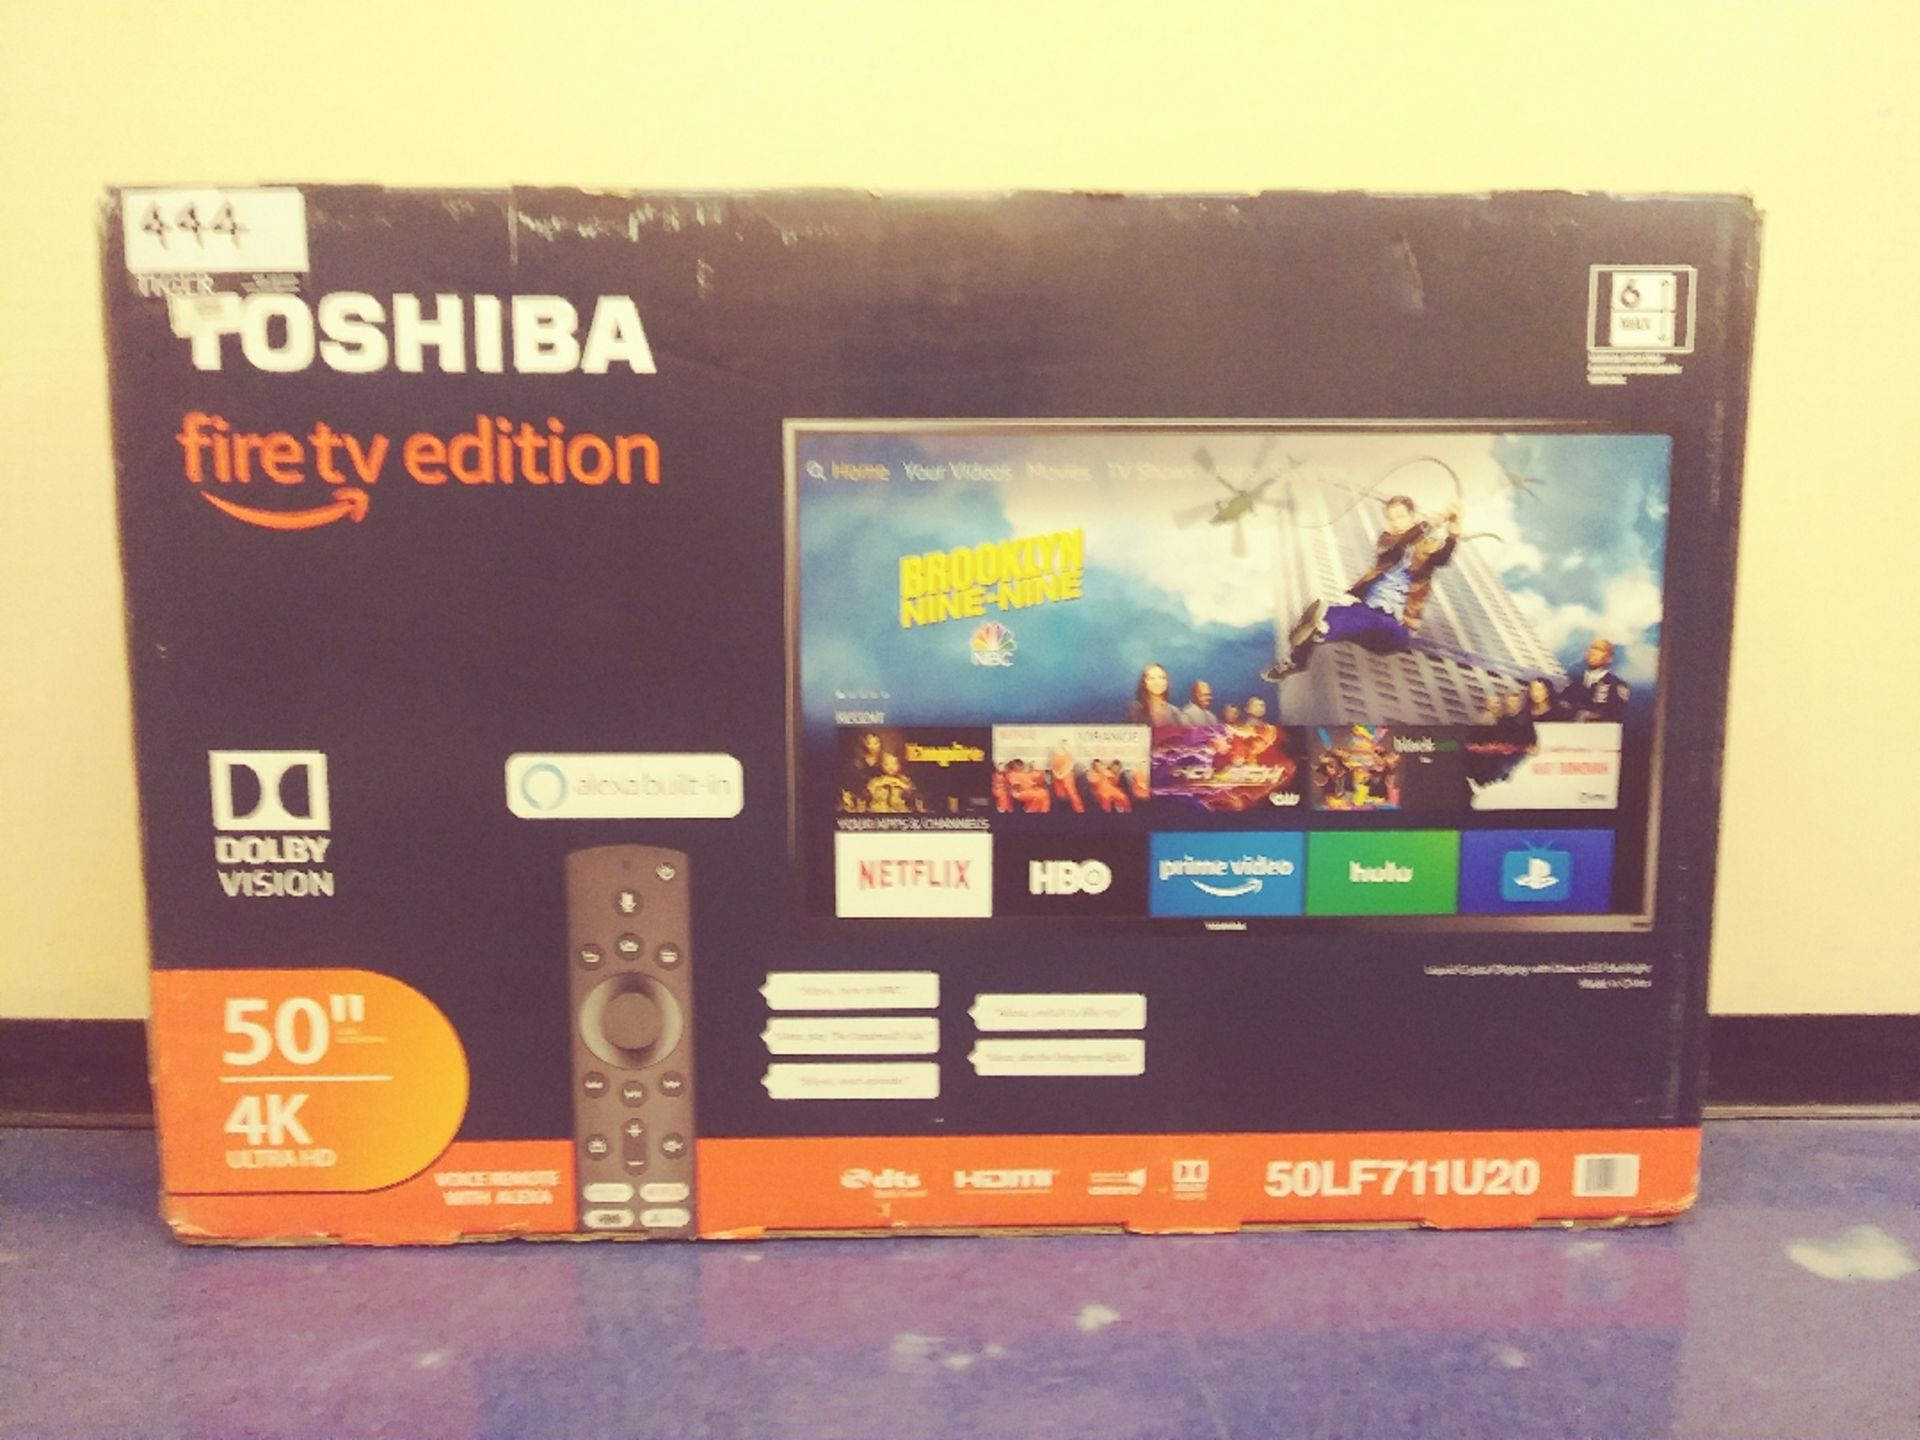 Toshiba 50in 4k Ultra HD TV - Image 3 of 3